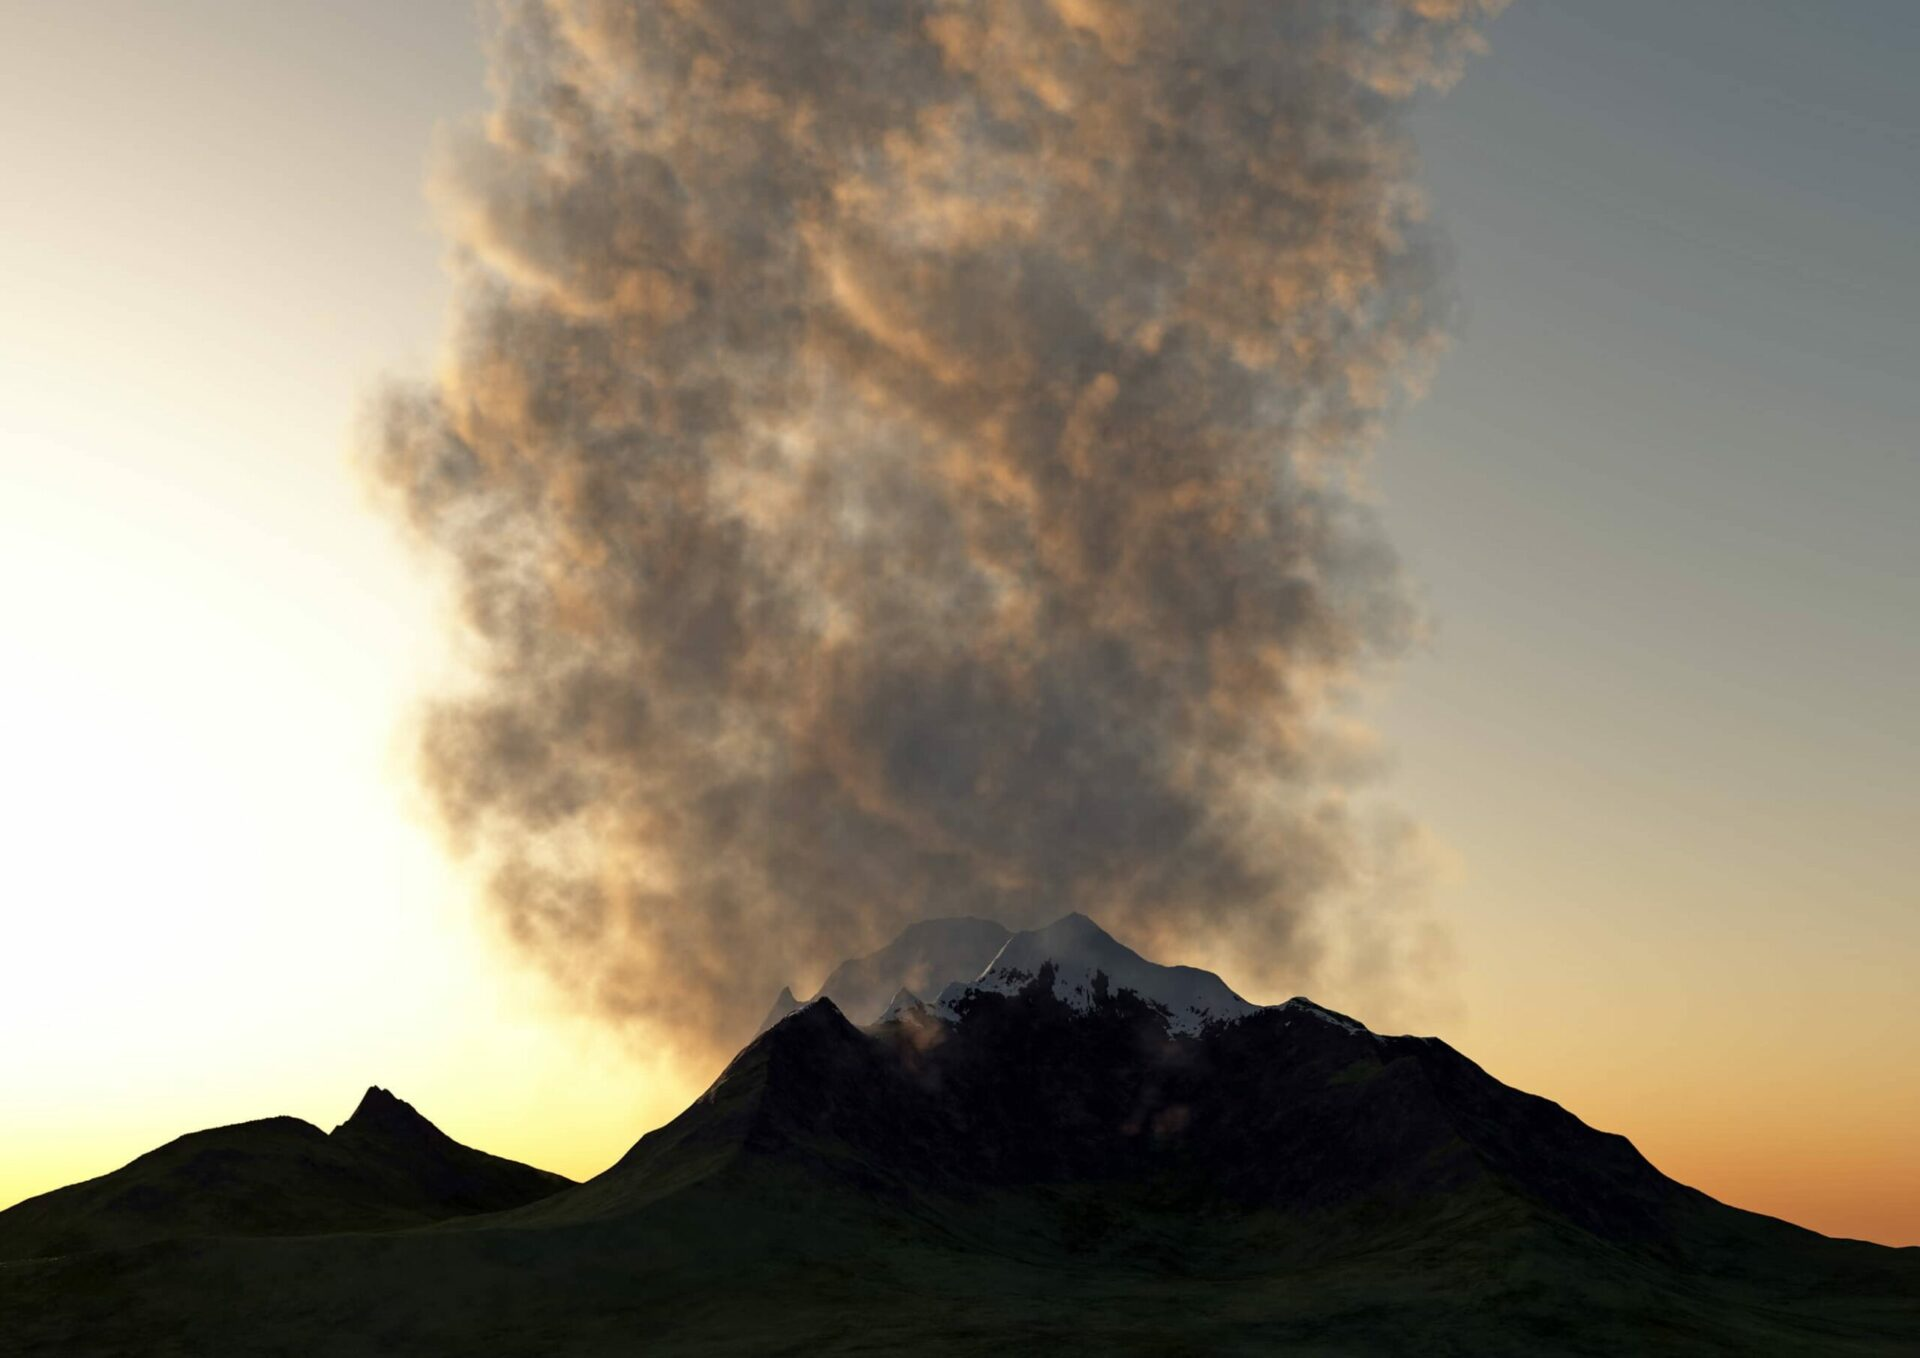 Grímsvötn Volcano in Iceland